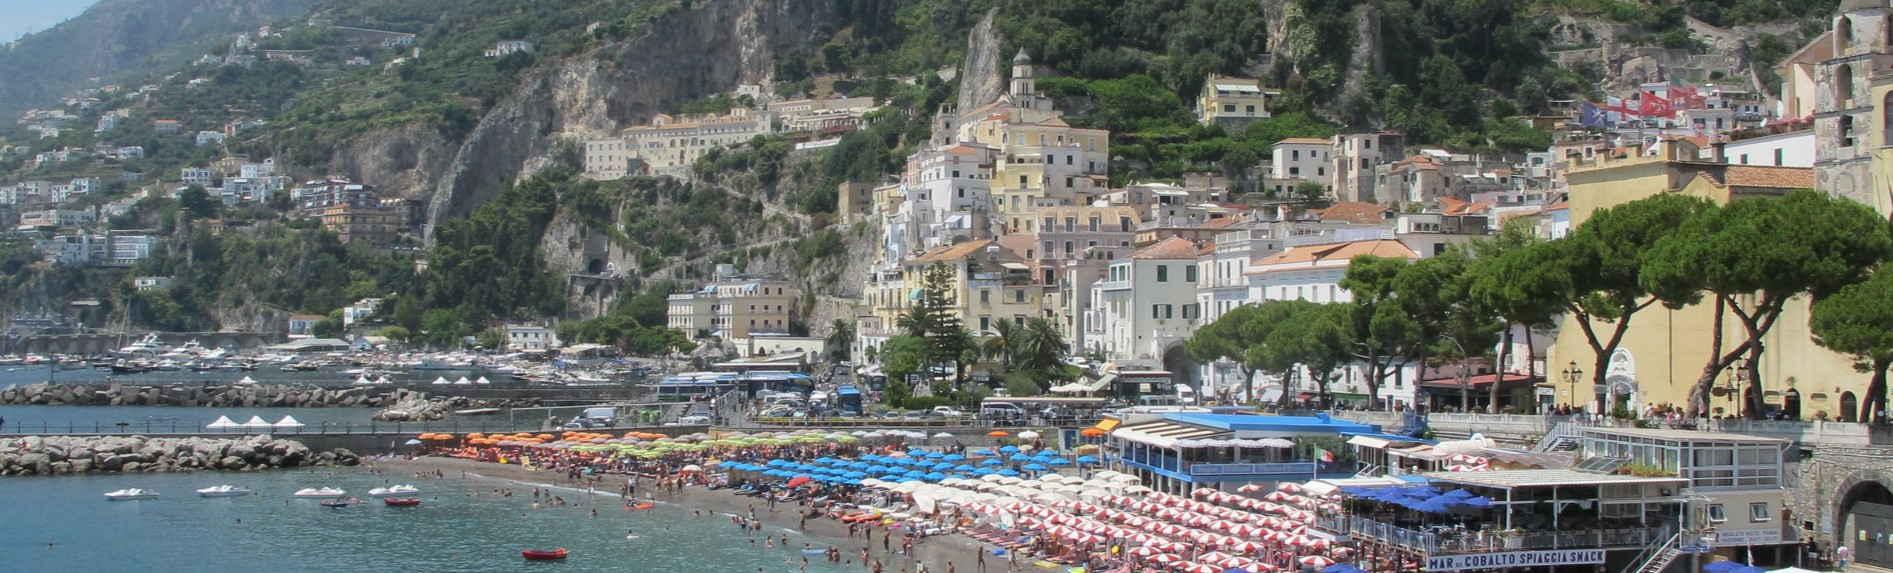 Amalfi Coast Tours are Available Now!